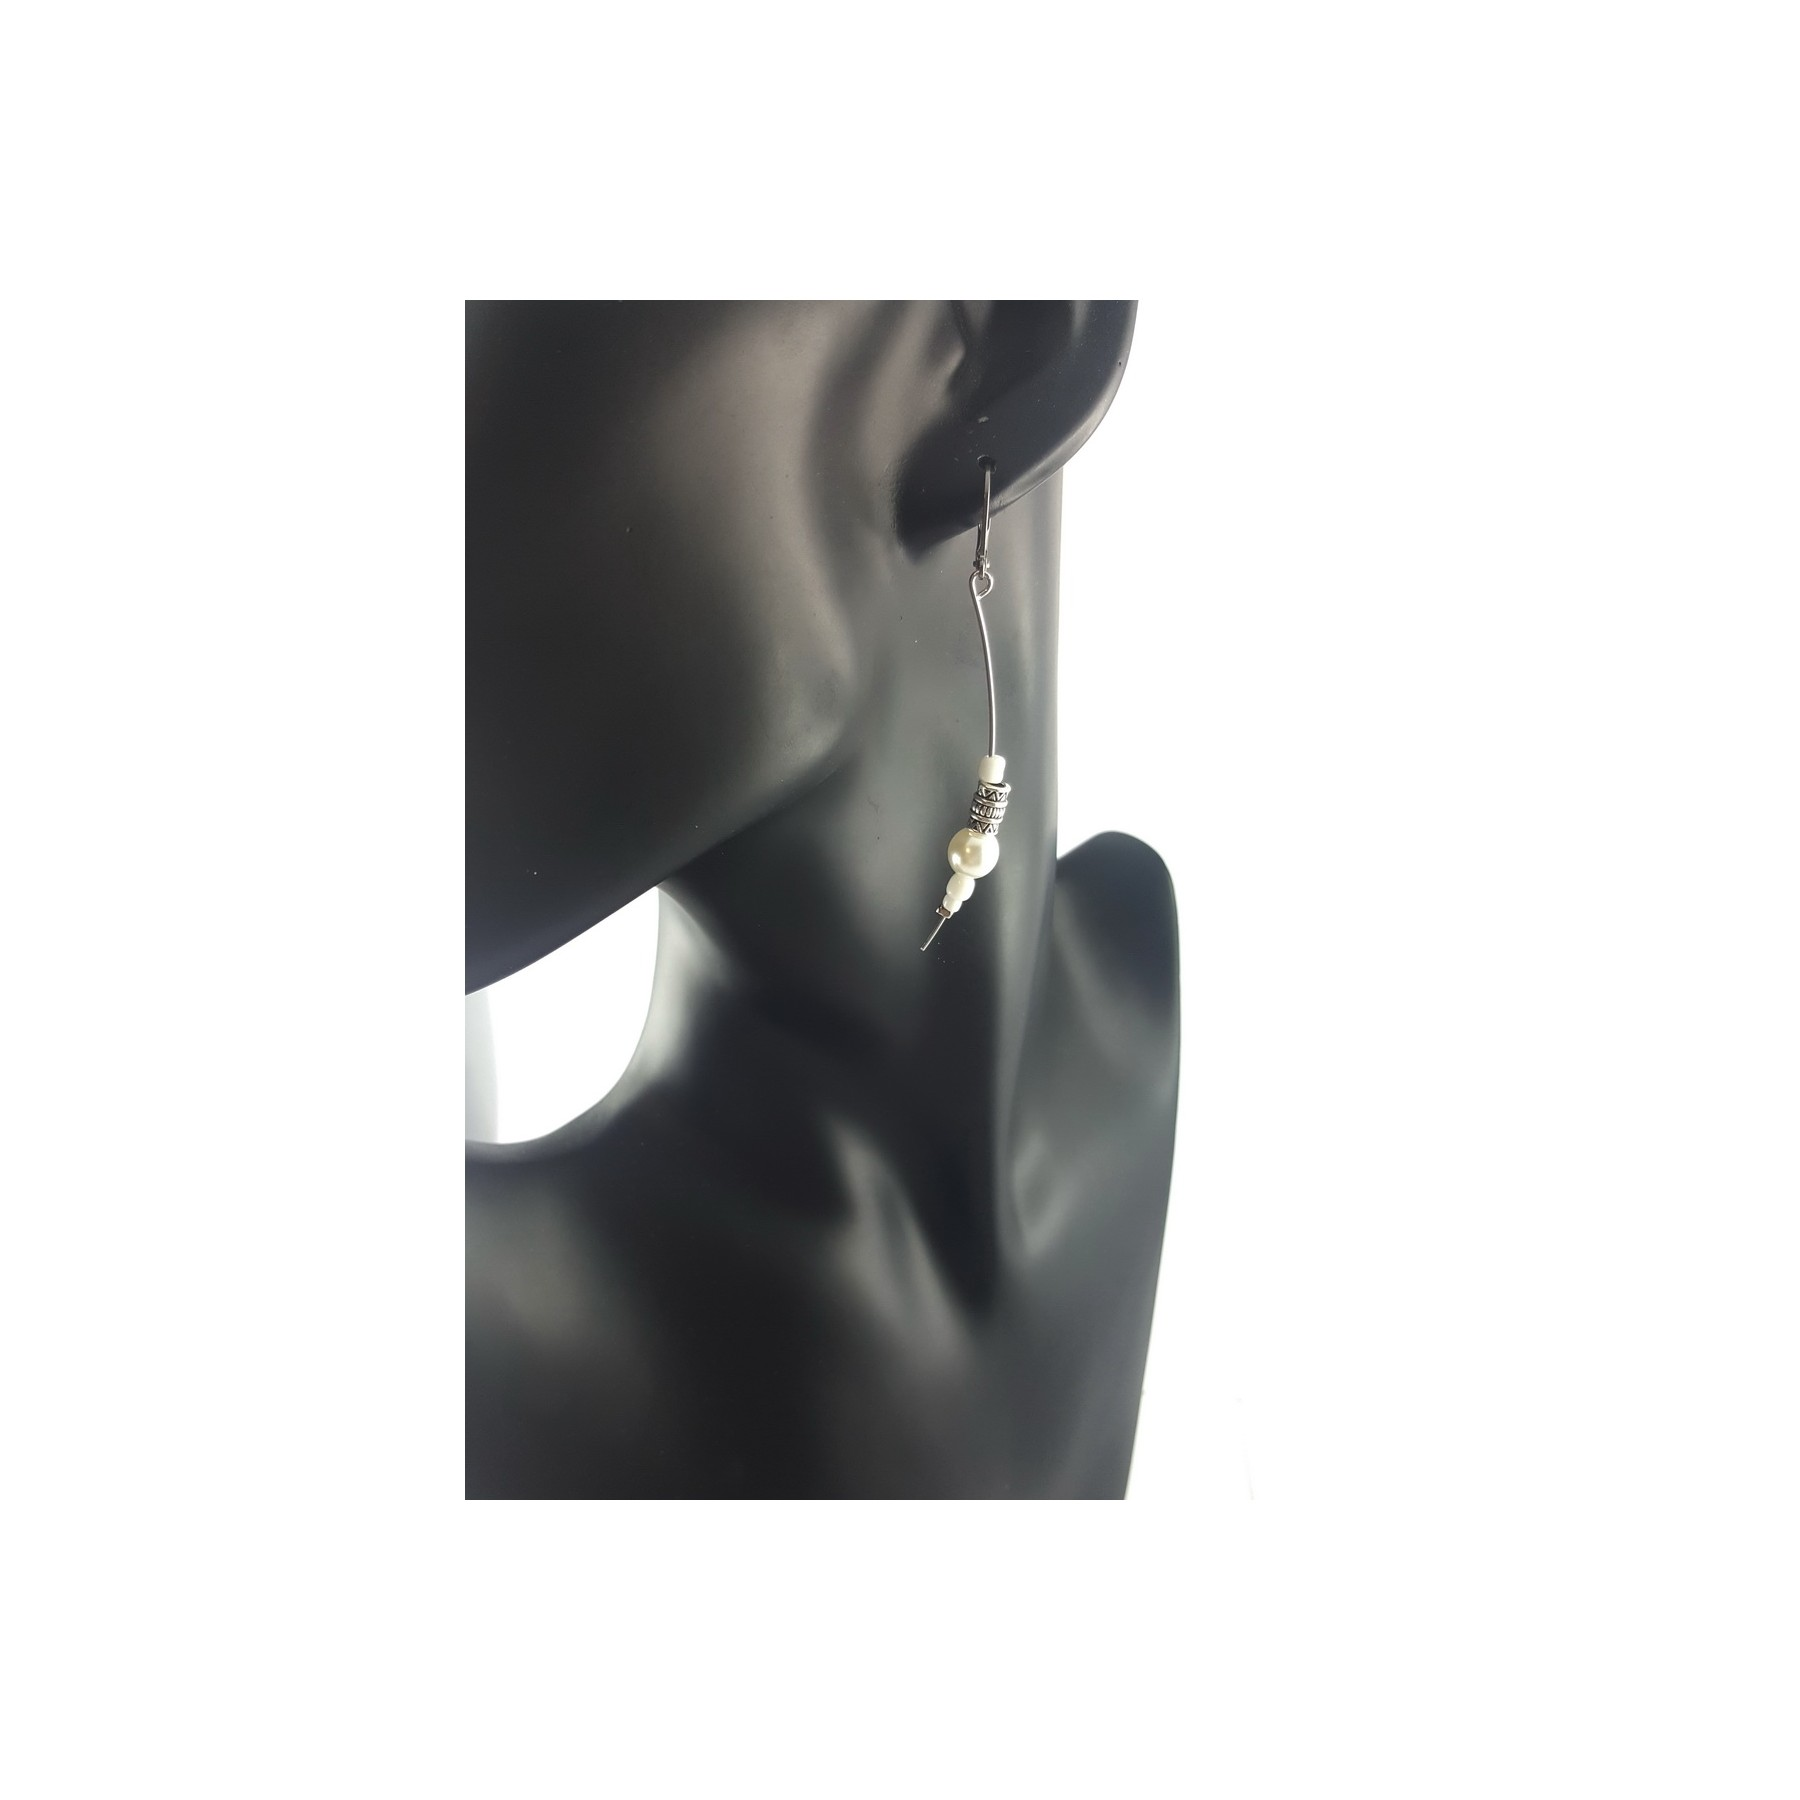 BO perles blanches sur fil rigide